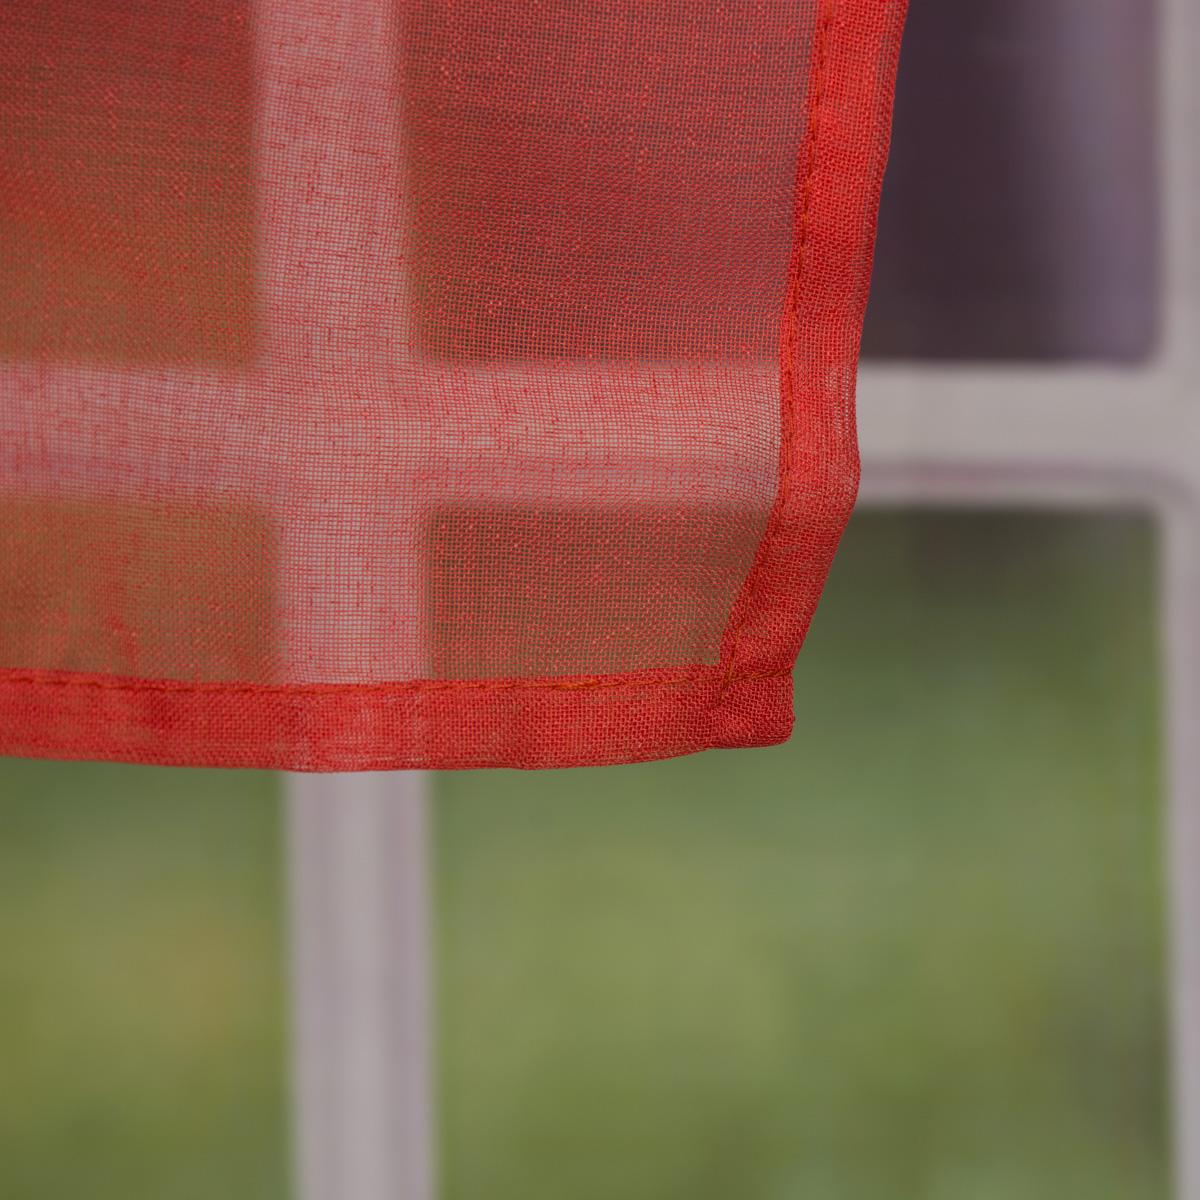 fertiggardine sengardine einfarbig voile struktur coralle rot 135x260cm fertiggardinen senschals. Black Bedroom Furniture Sets. Home Design Ideas